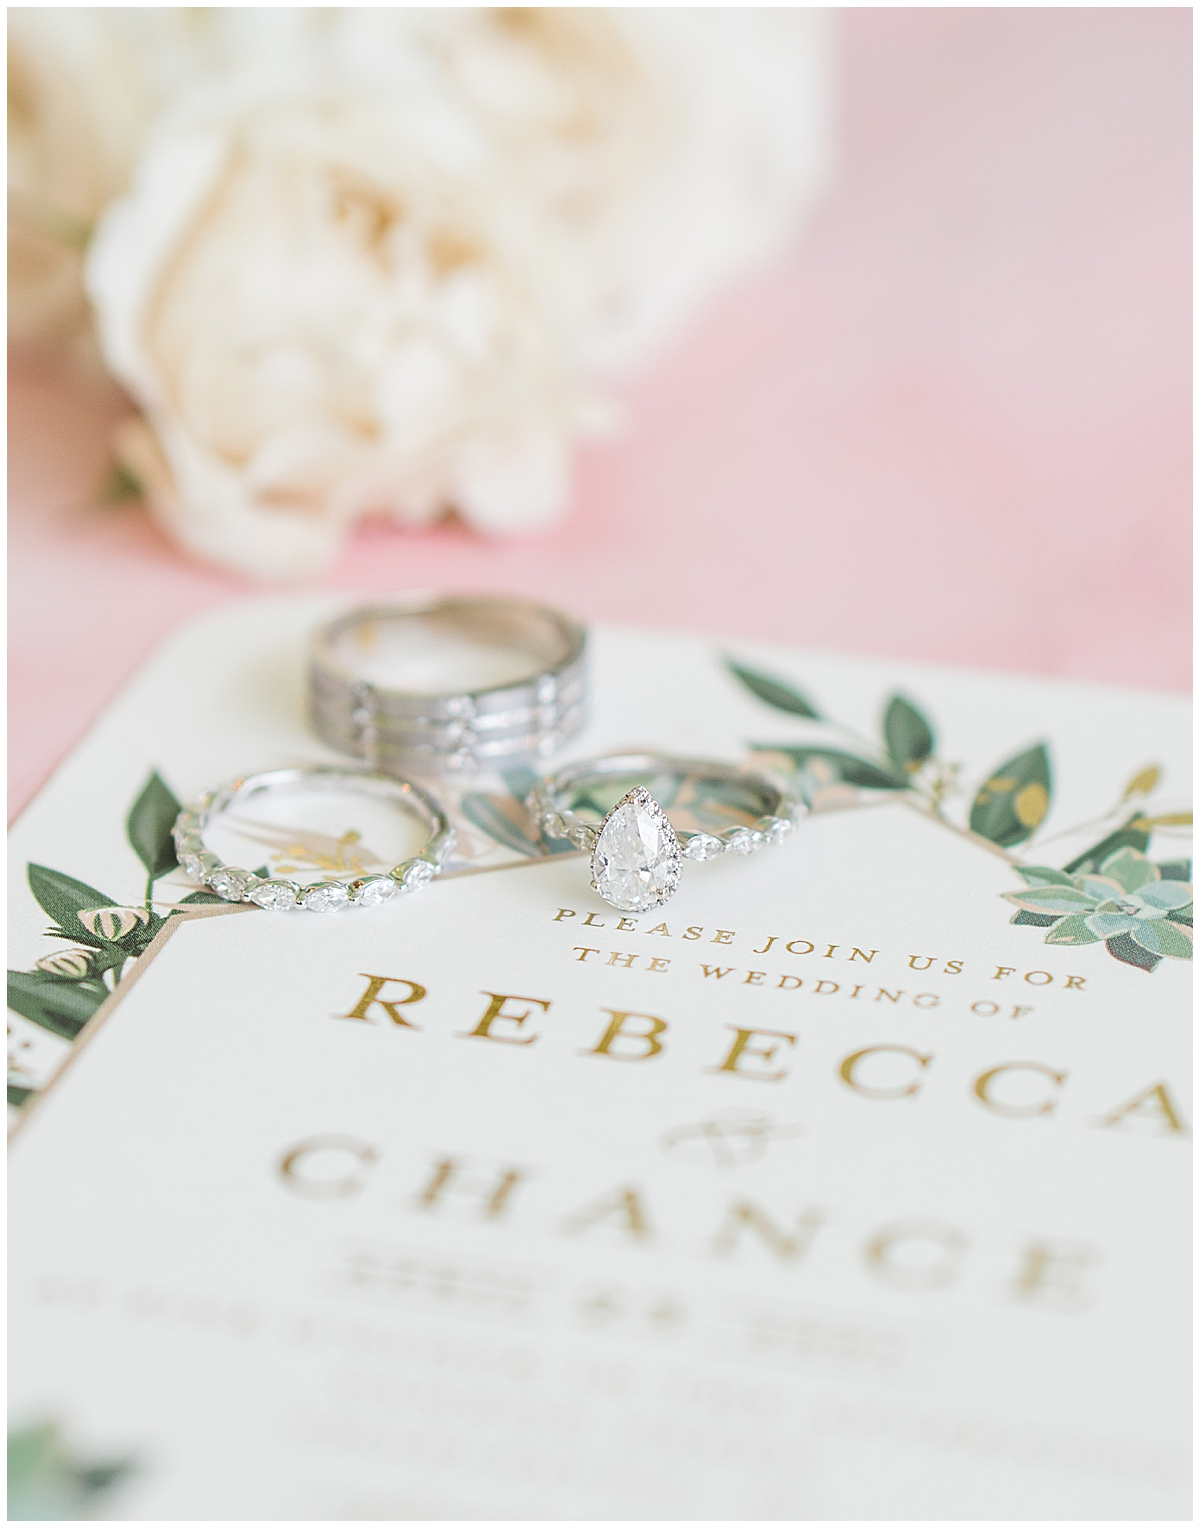 wedding rings rest on wedding invitation for Cannon Green wedding